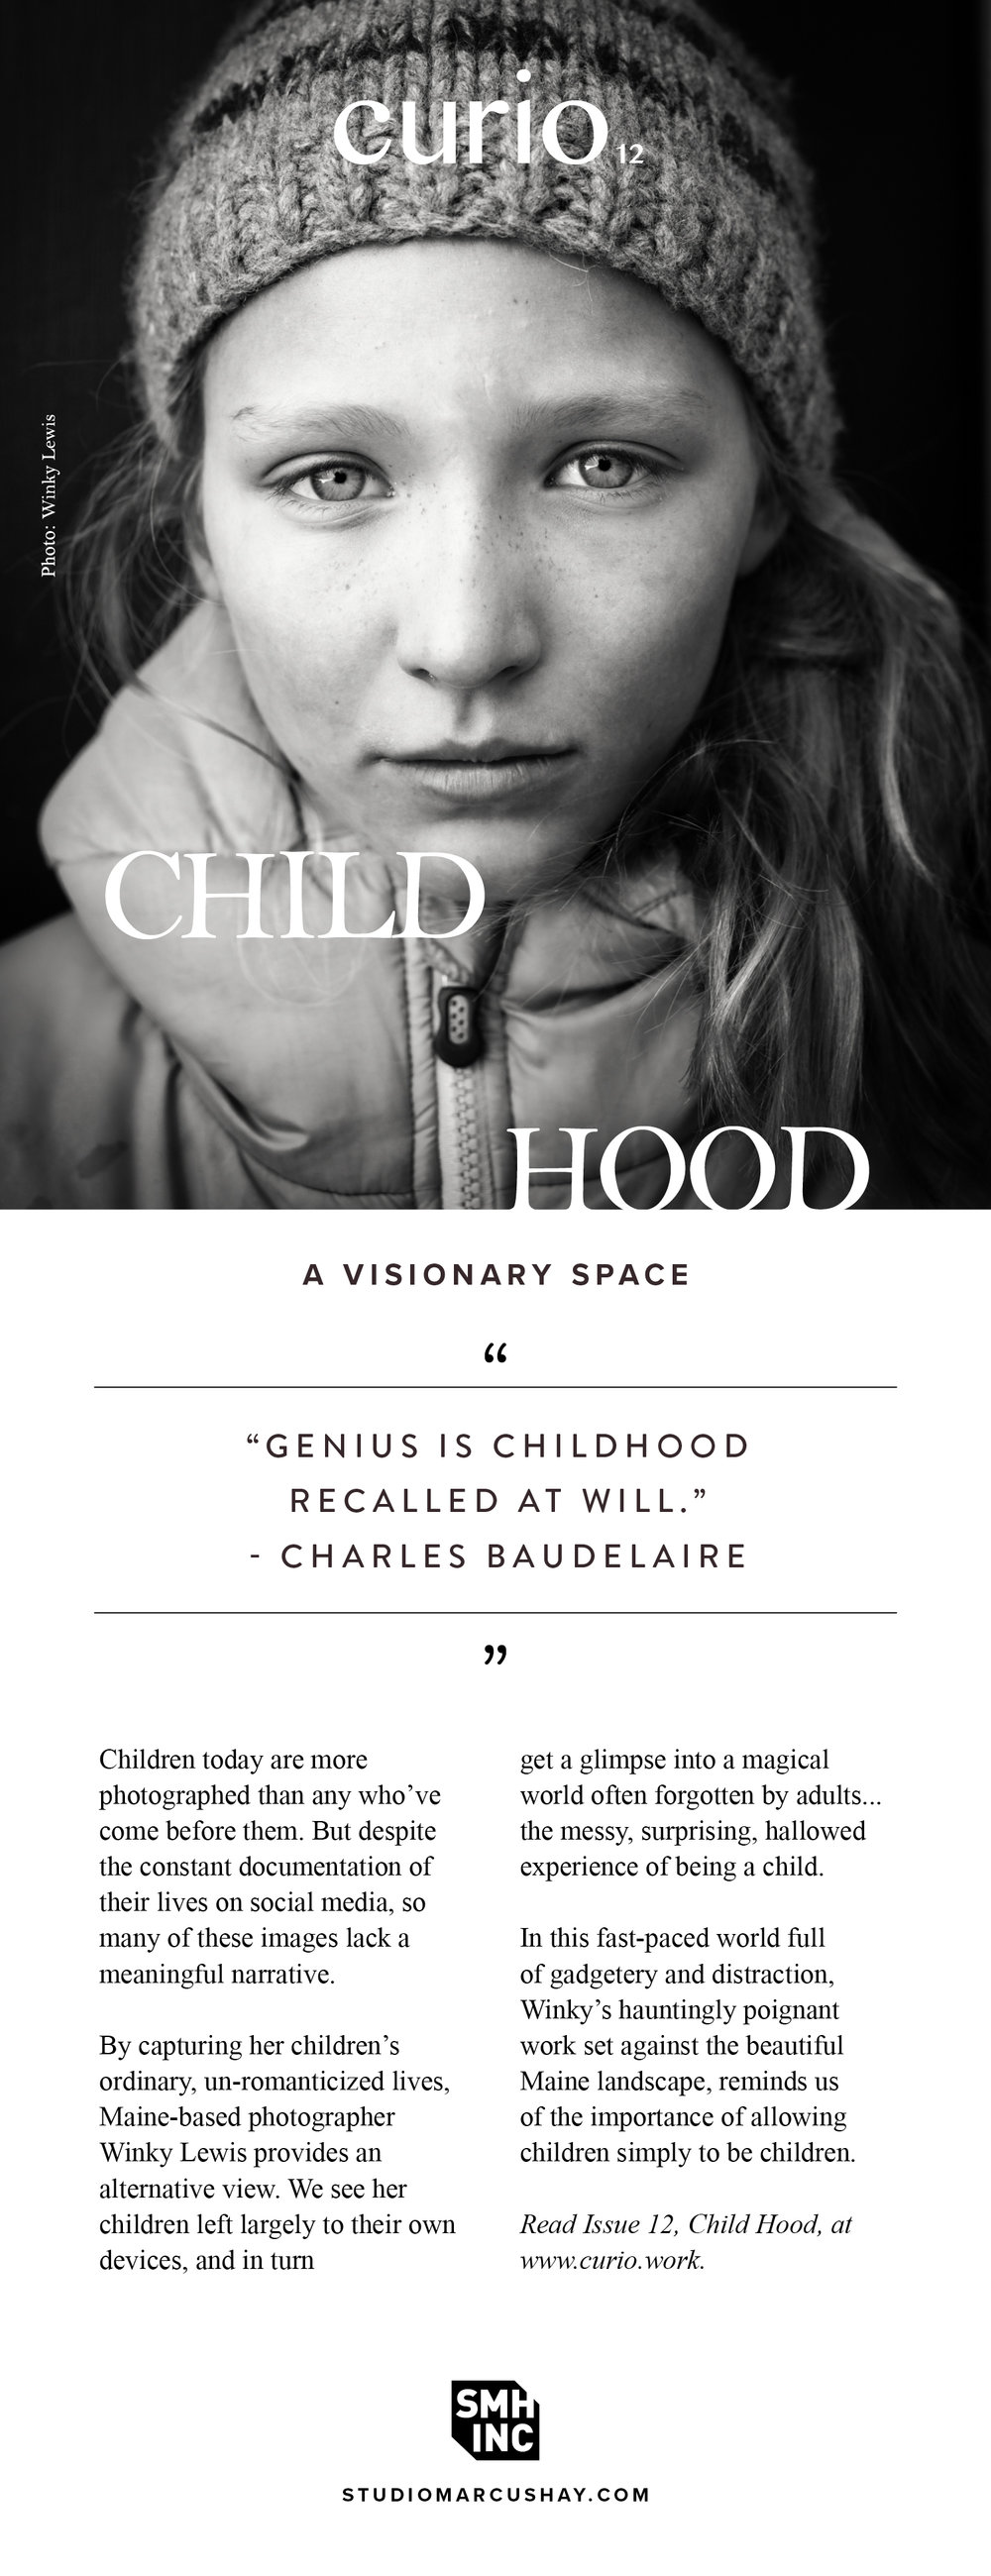 ChildHood_Mailer.jpg